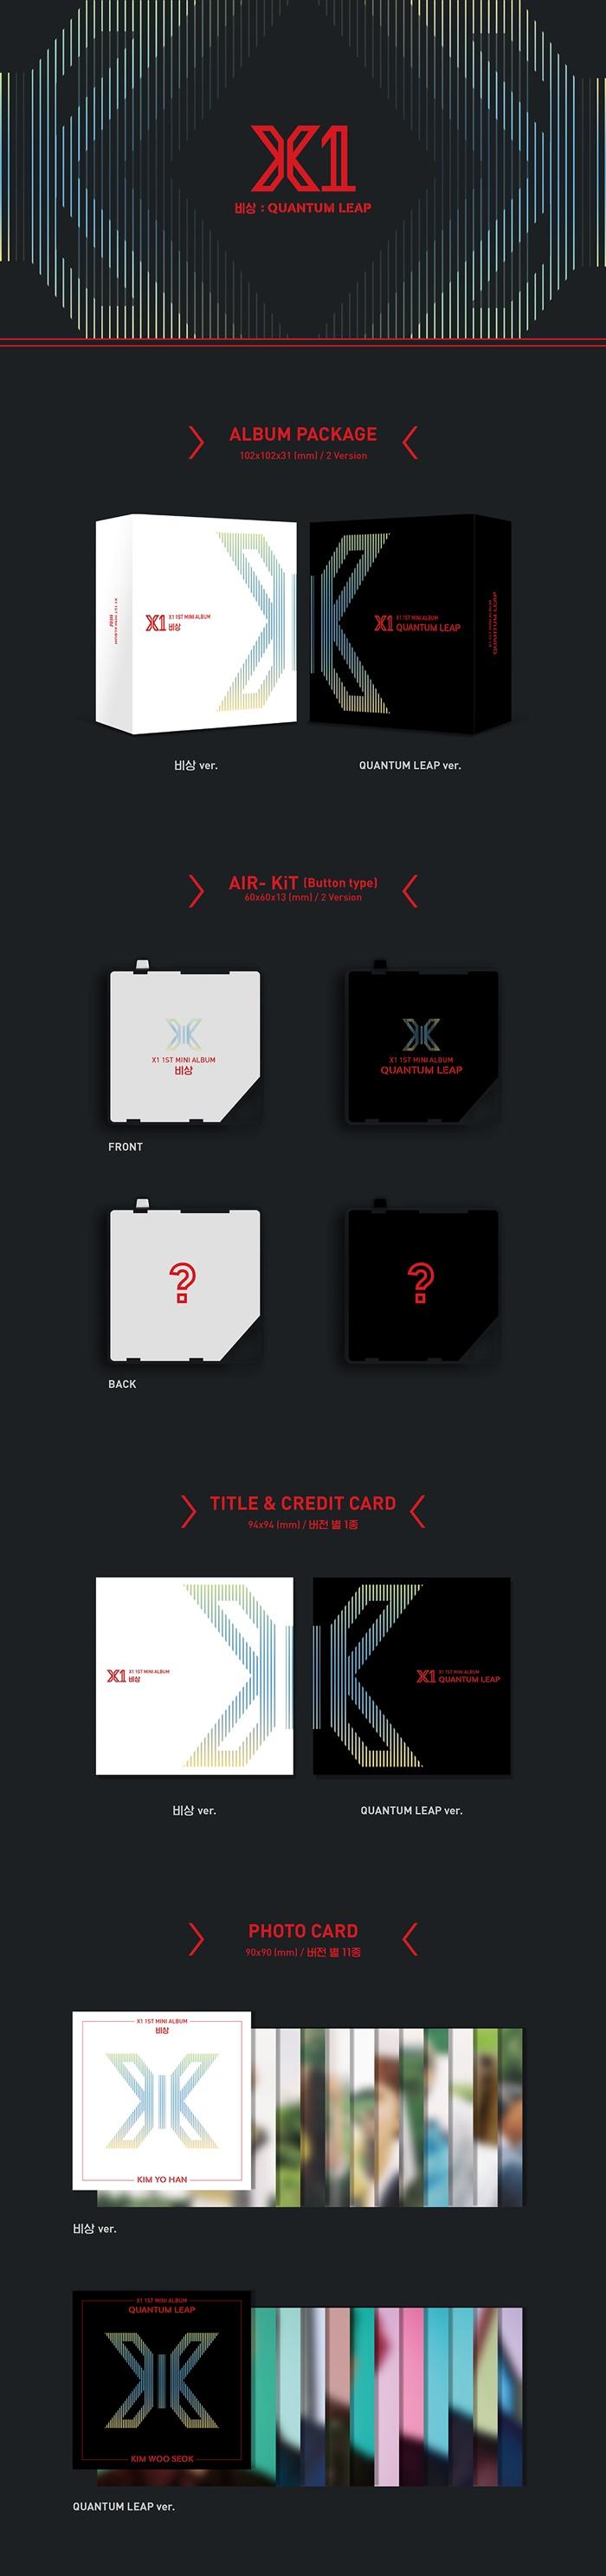 Kit X1 1st Mini Kihno Album 비상 Quantum Leap 비상 Ver Air Kit